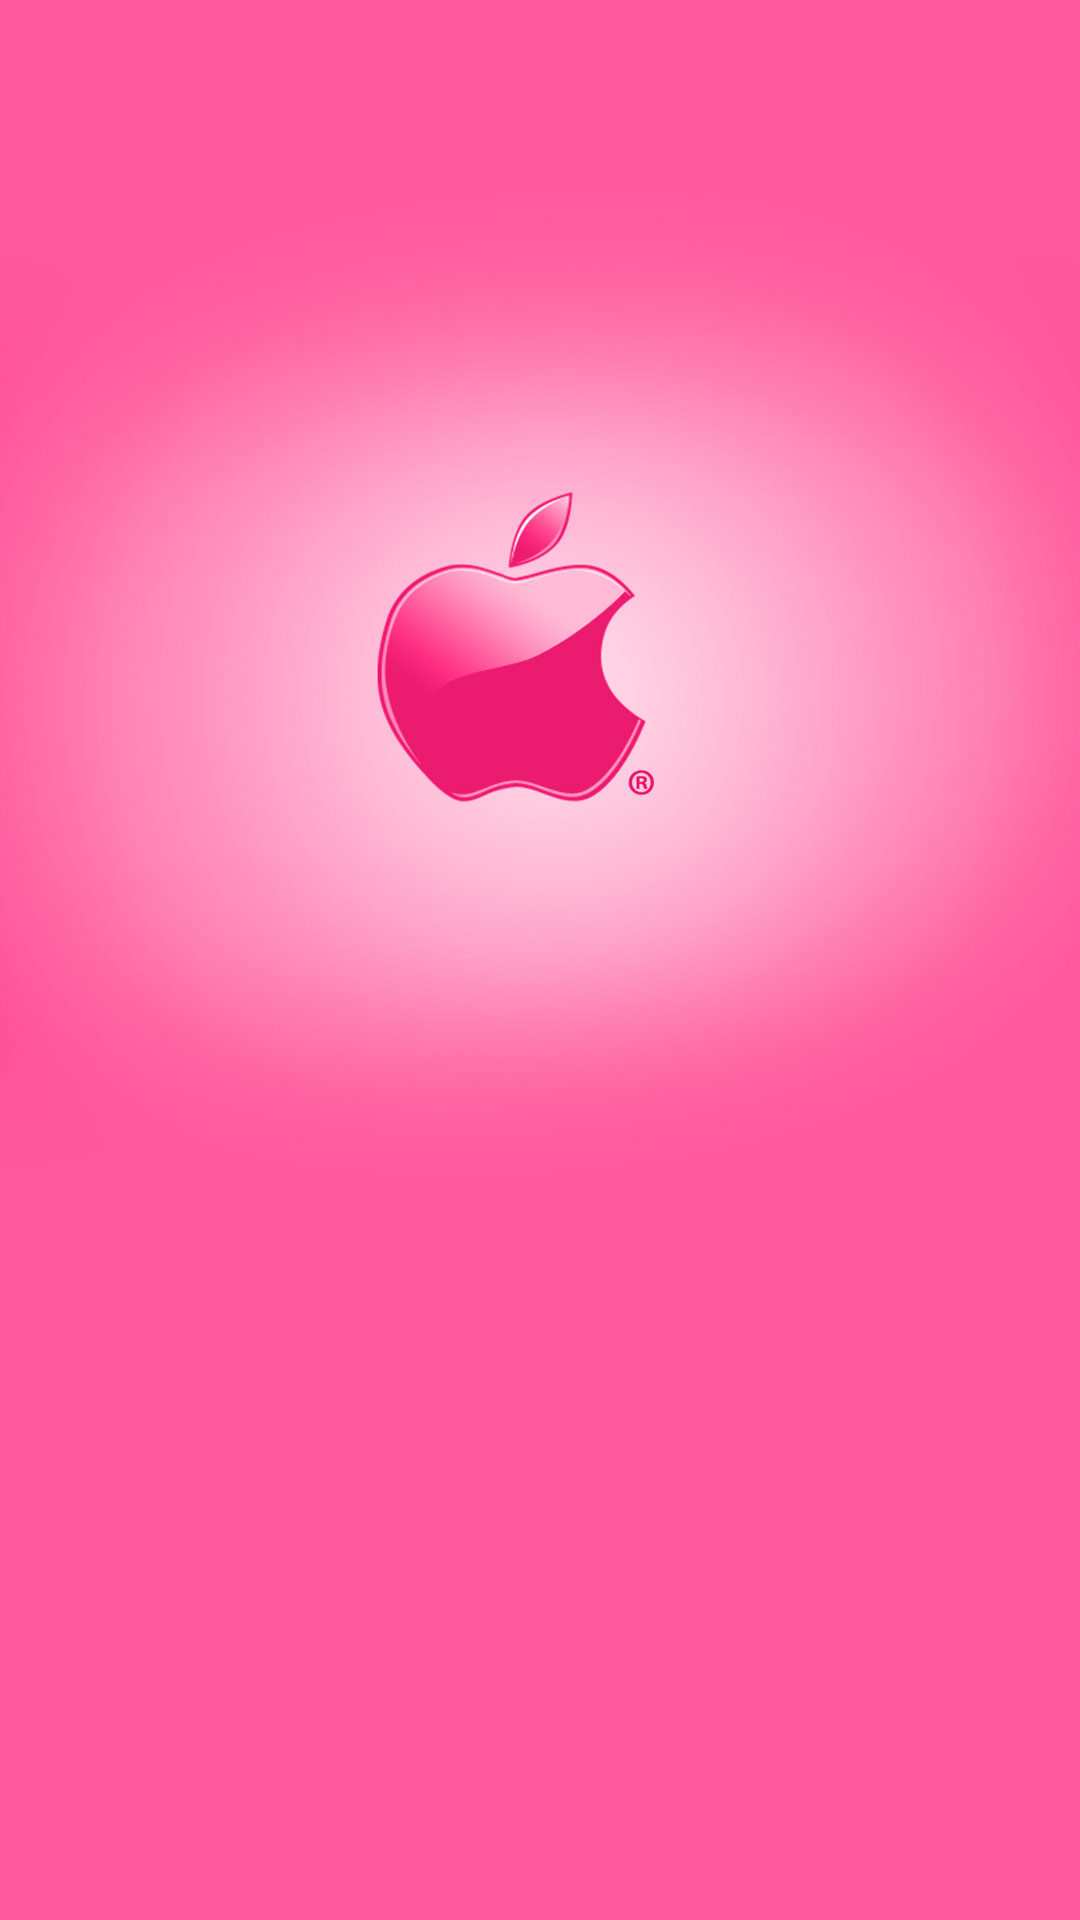 Pink 3d iphone wallpaper